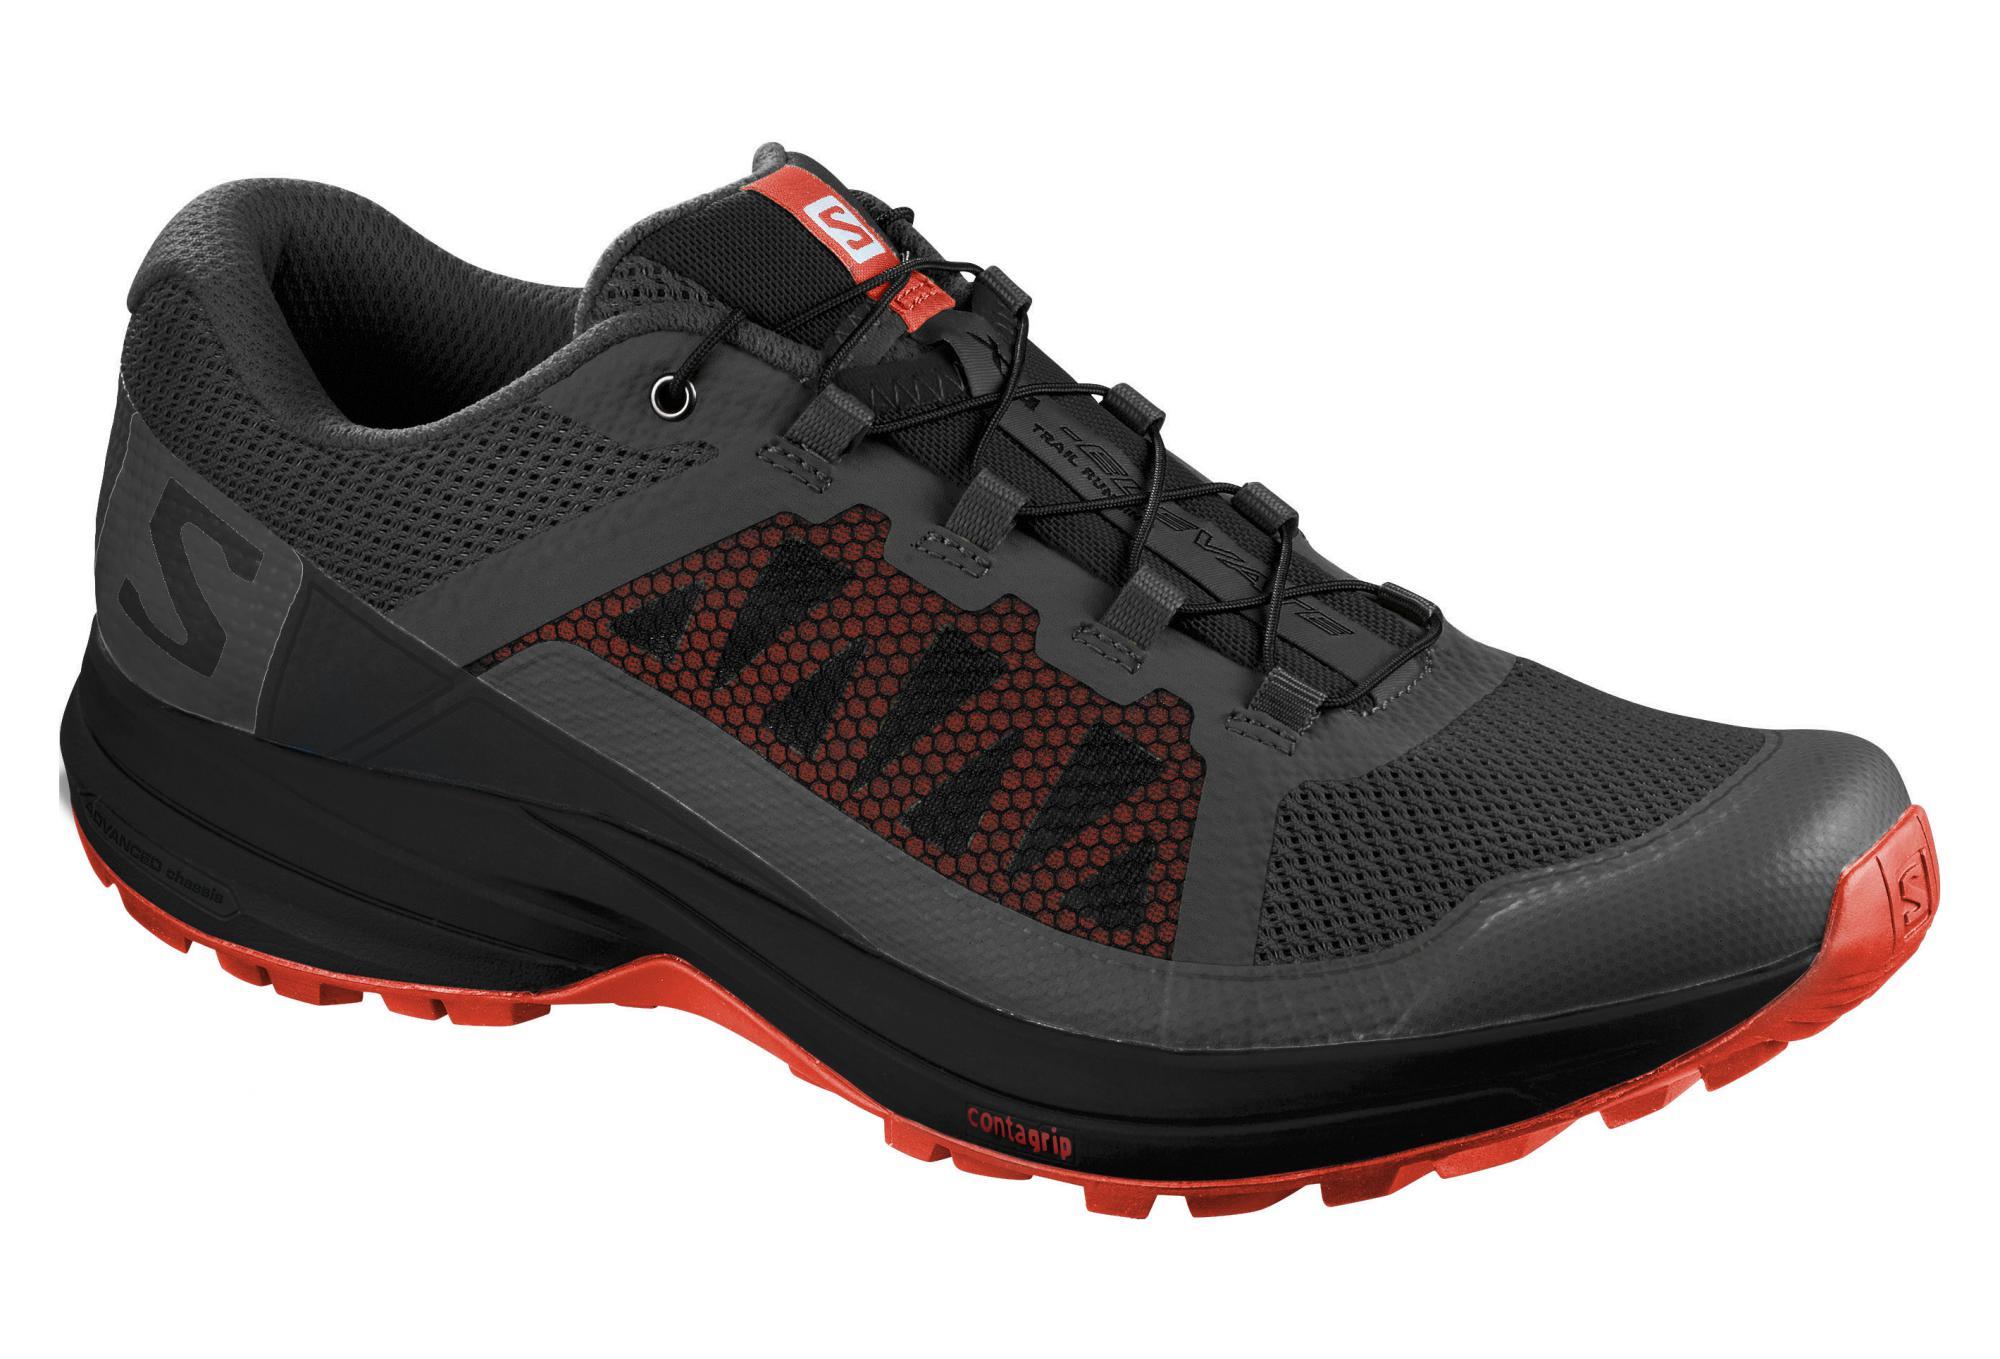 Salomon XA Elevate Shoes Magnet Cherry Black